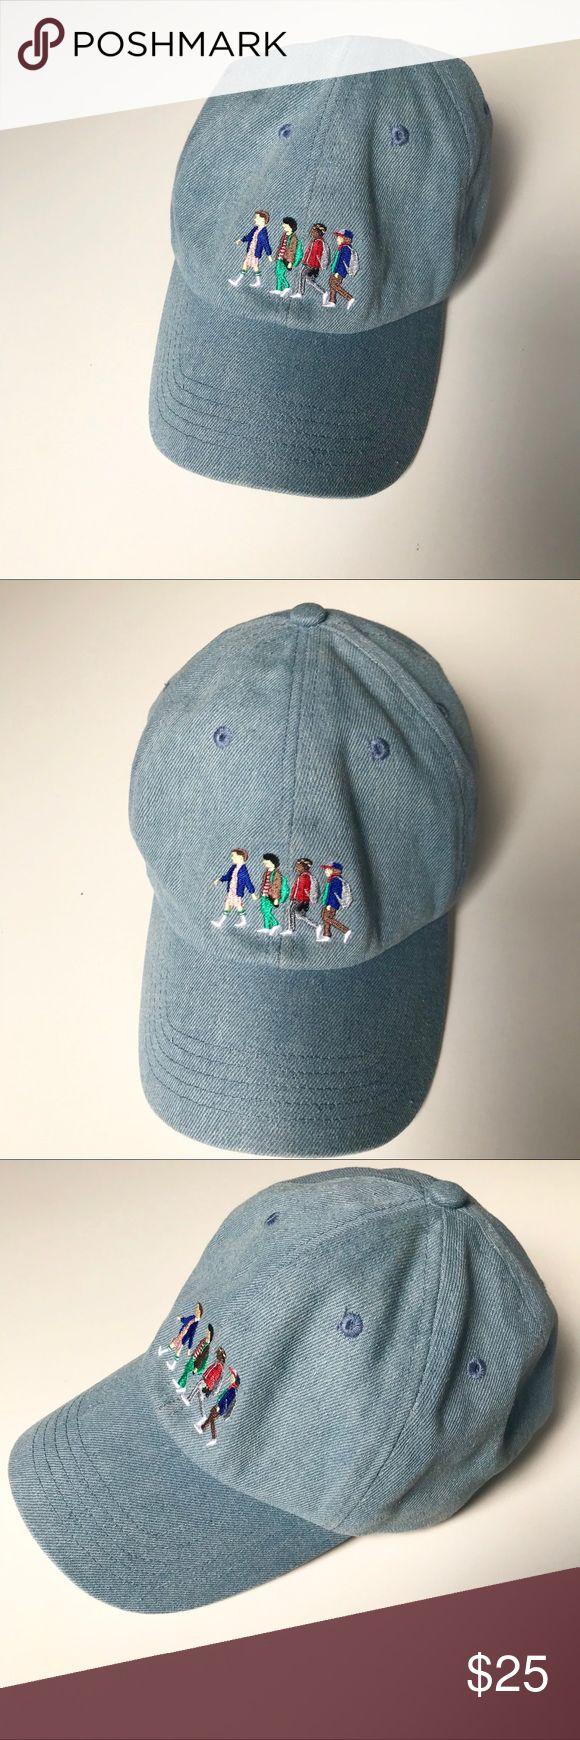 Stranger Things Embroidered Denim Hat Embroidered denim